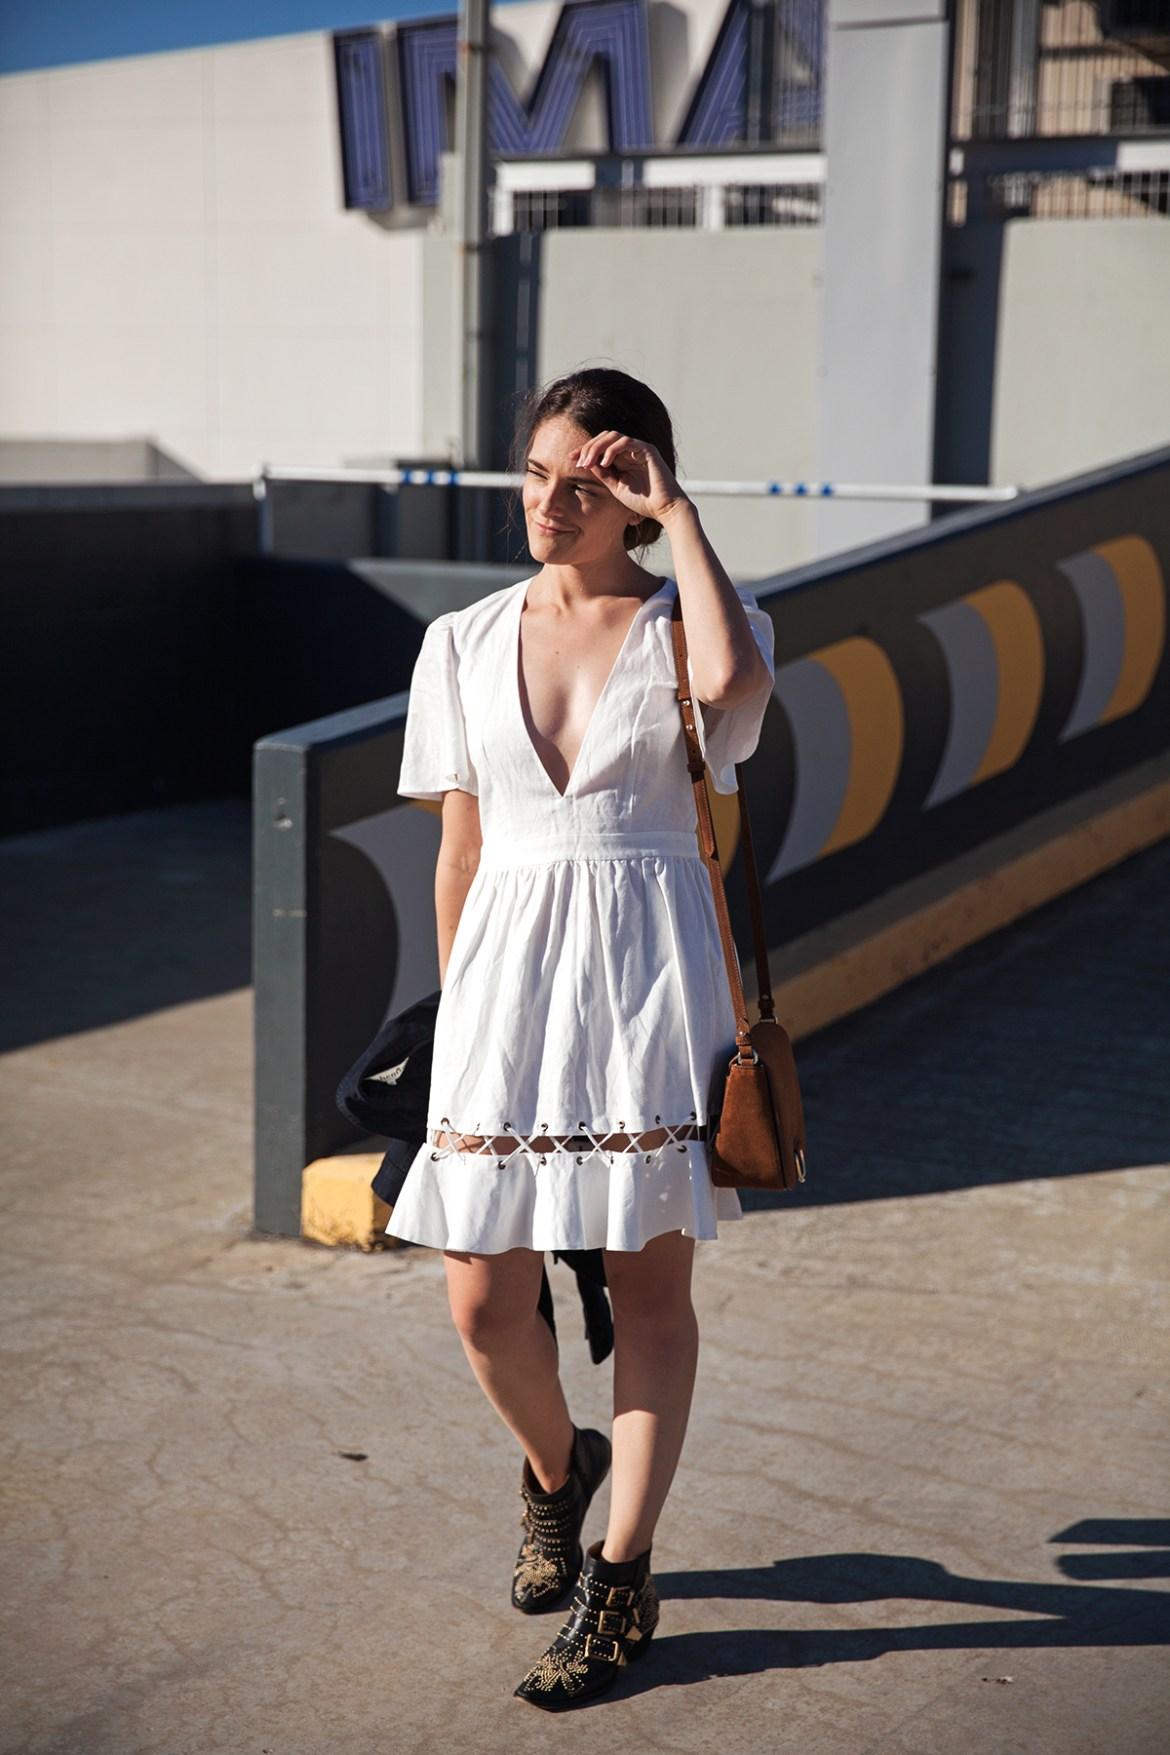 The white summer dress how to style, Inspiring Wit, Australian fashion blogger in Isla Positano dress